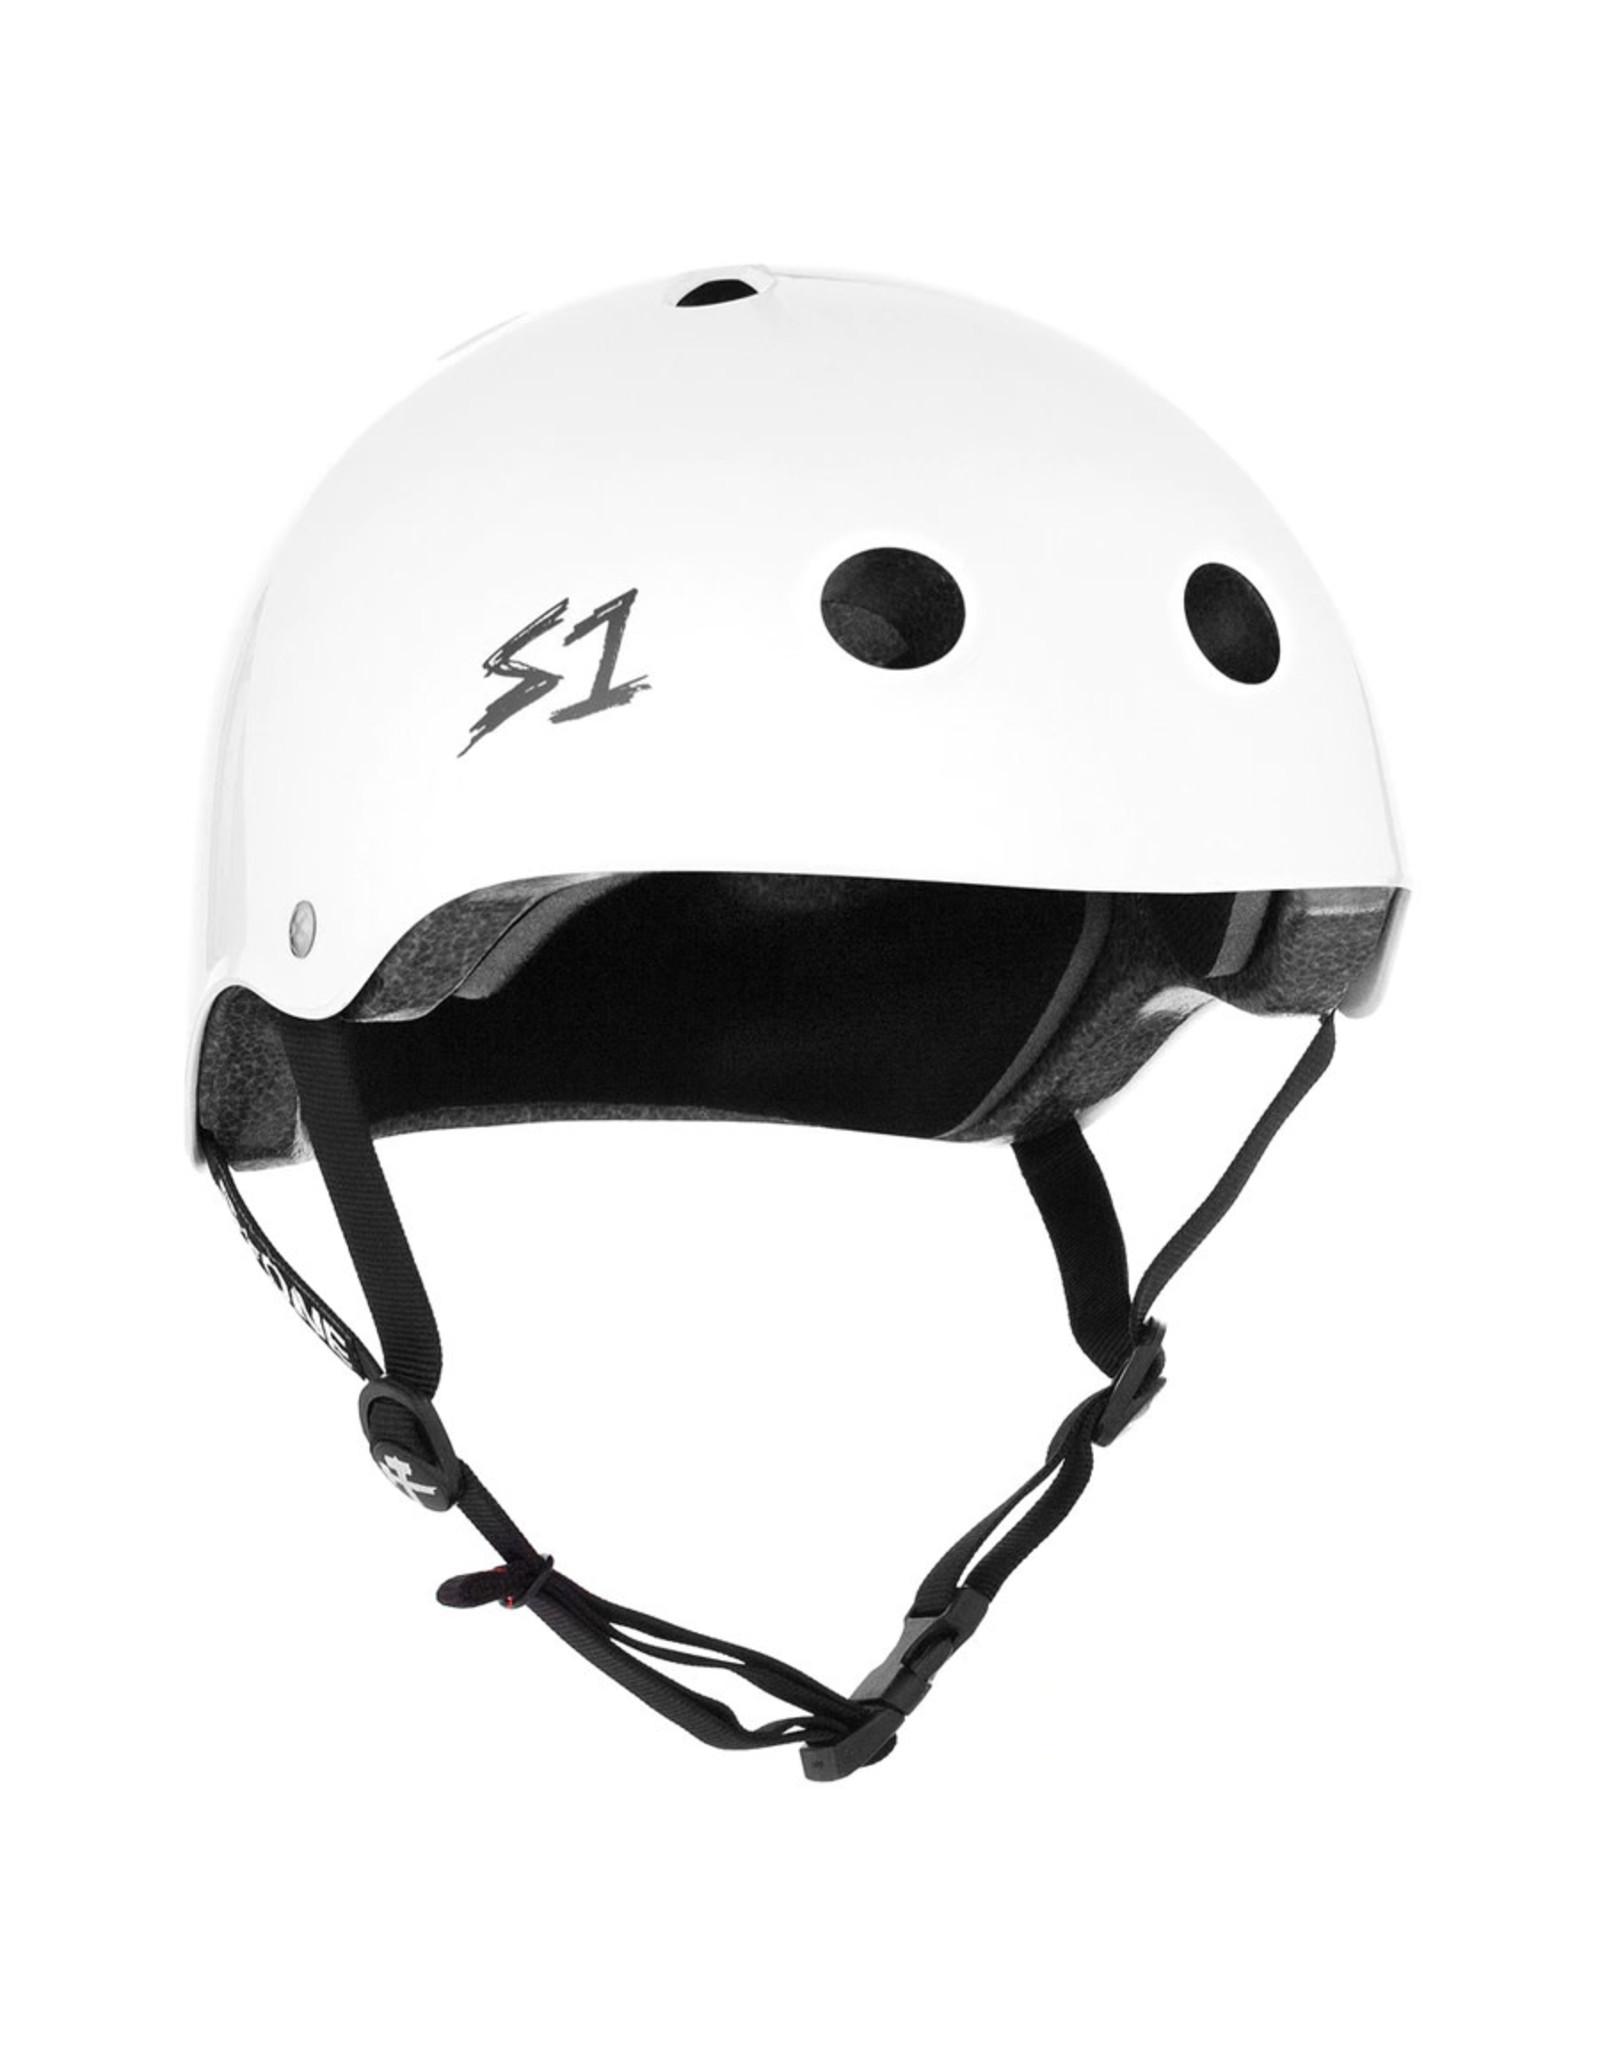 S-One S-One Helmet The Adult Lifer (White Gloss/Black Straps)